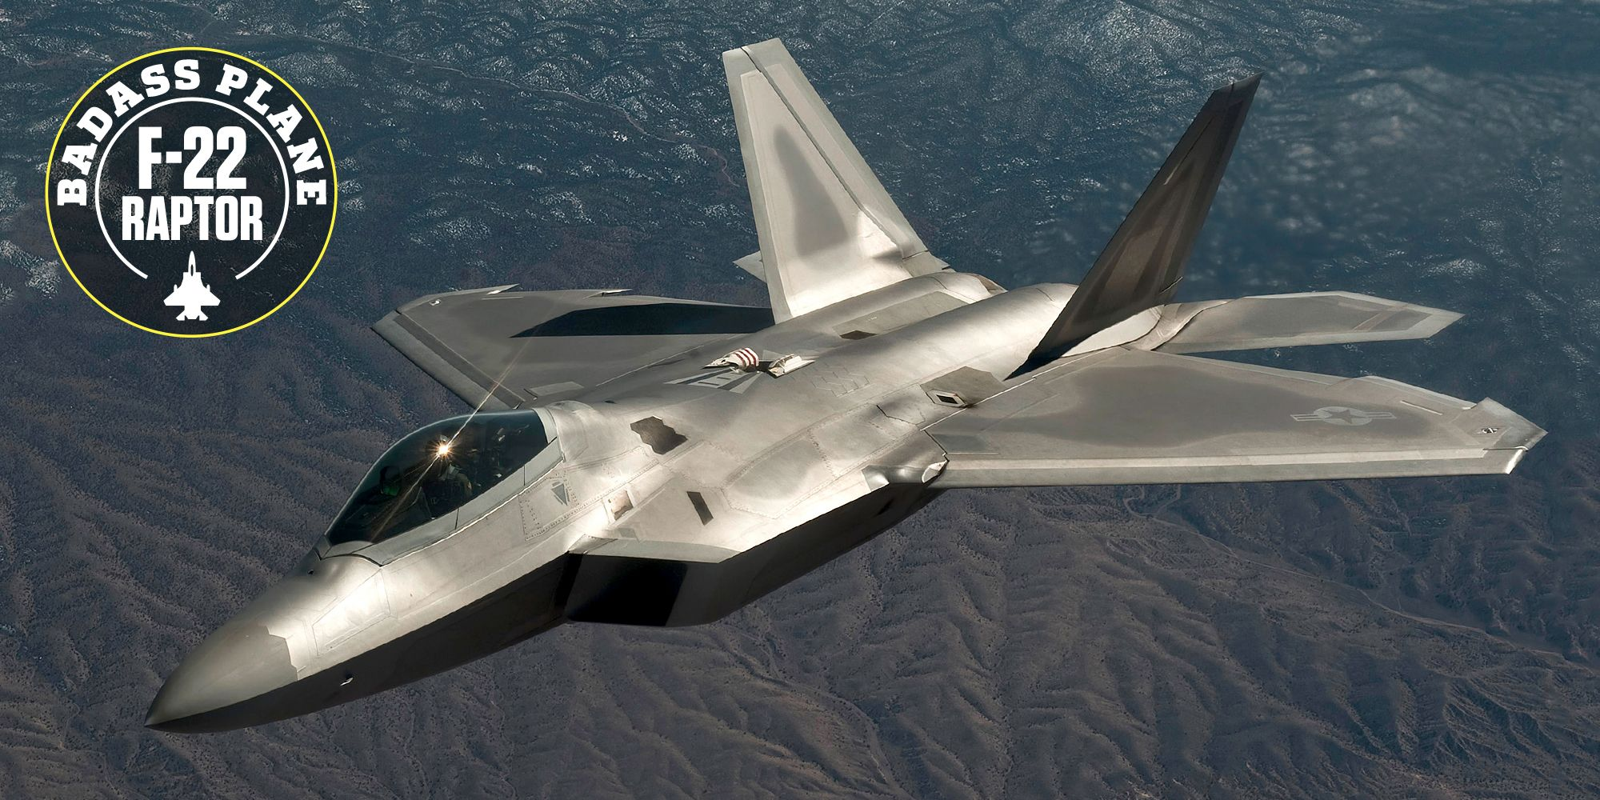 Thuc hu radar Trung Quoc co the theo doi may bay F-35 cua My?-Hinh-3